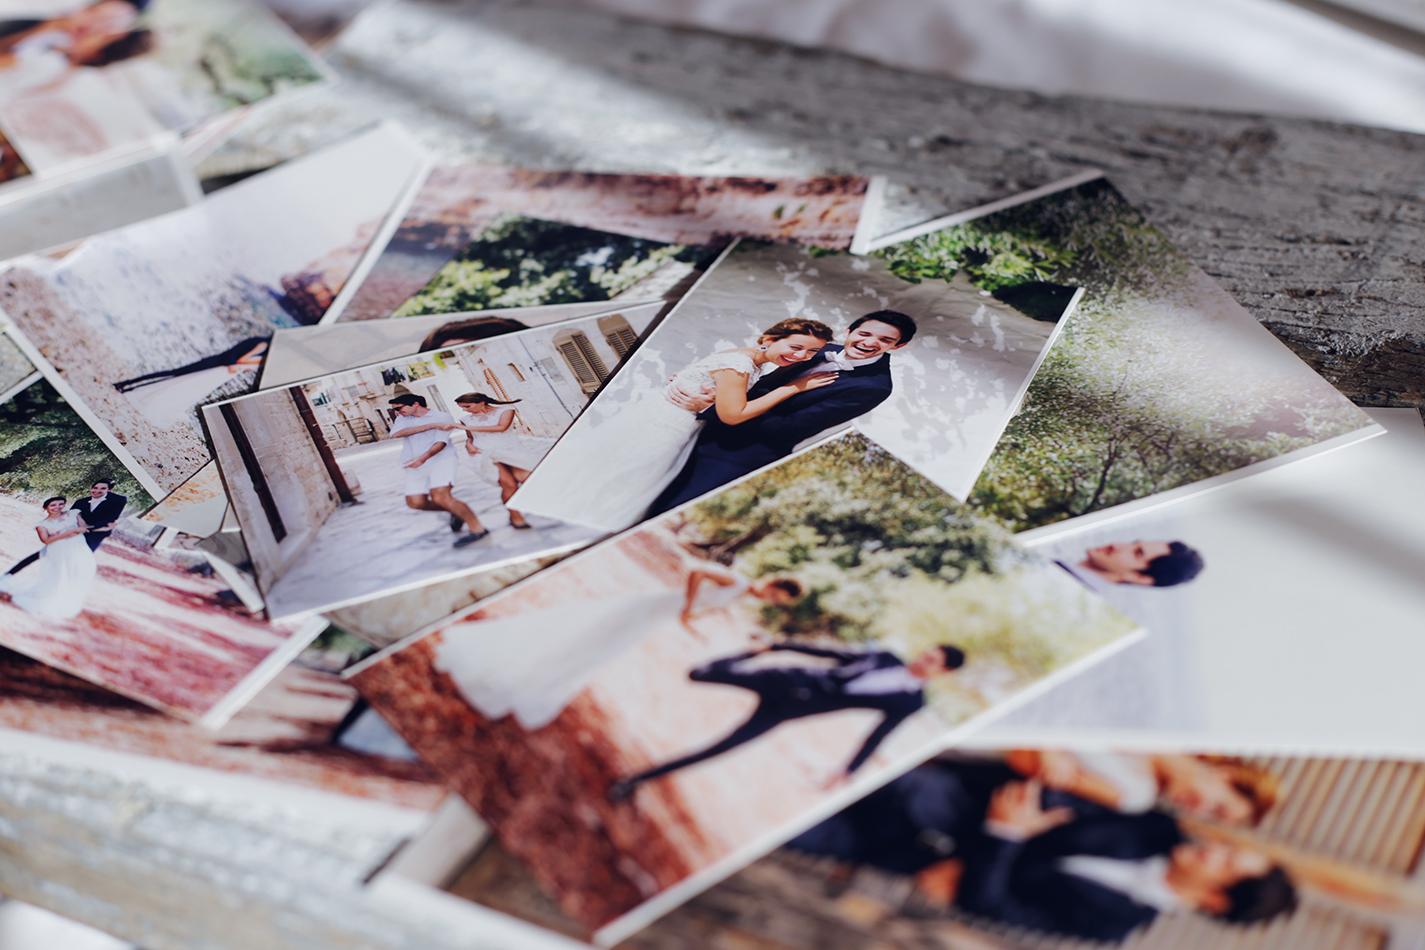 memories from bari_andreea iancu_04 small